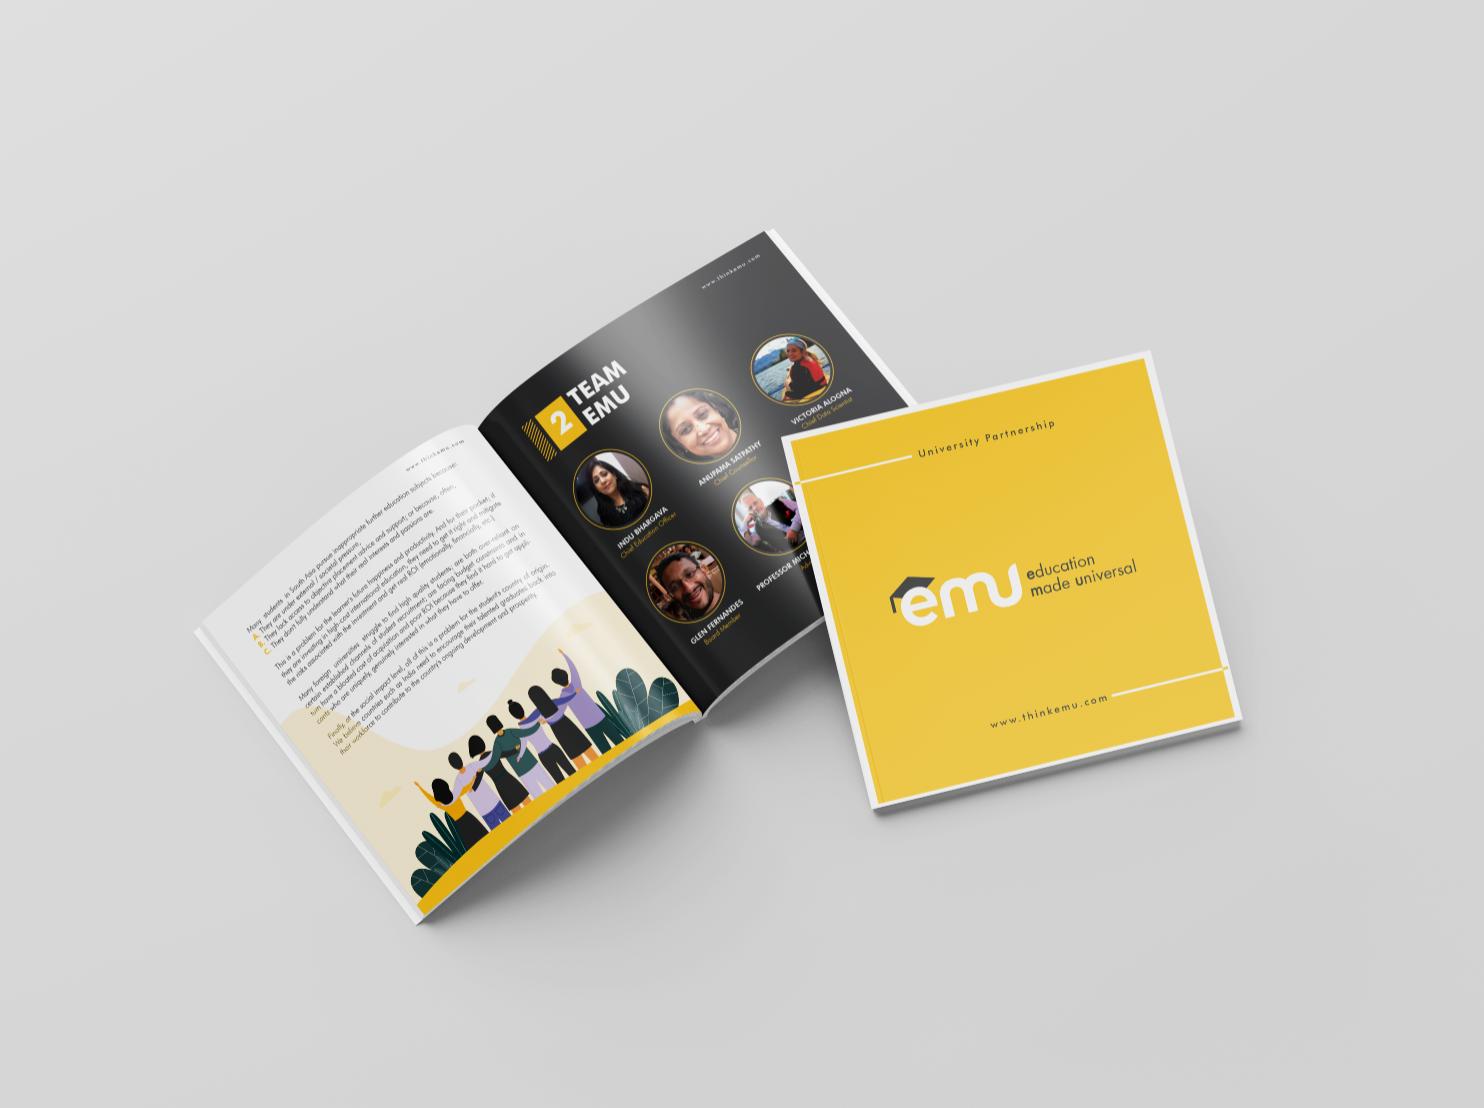 EMU Brochure mock-up by Artbox Global.png